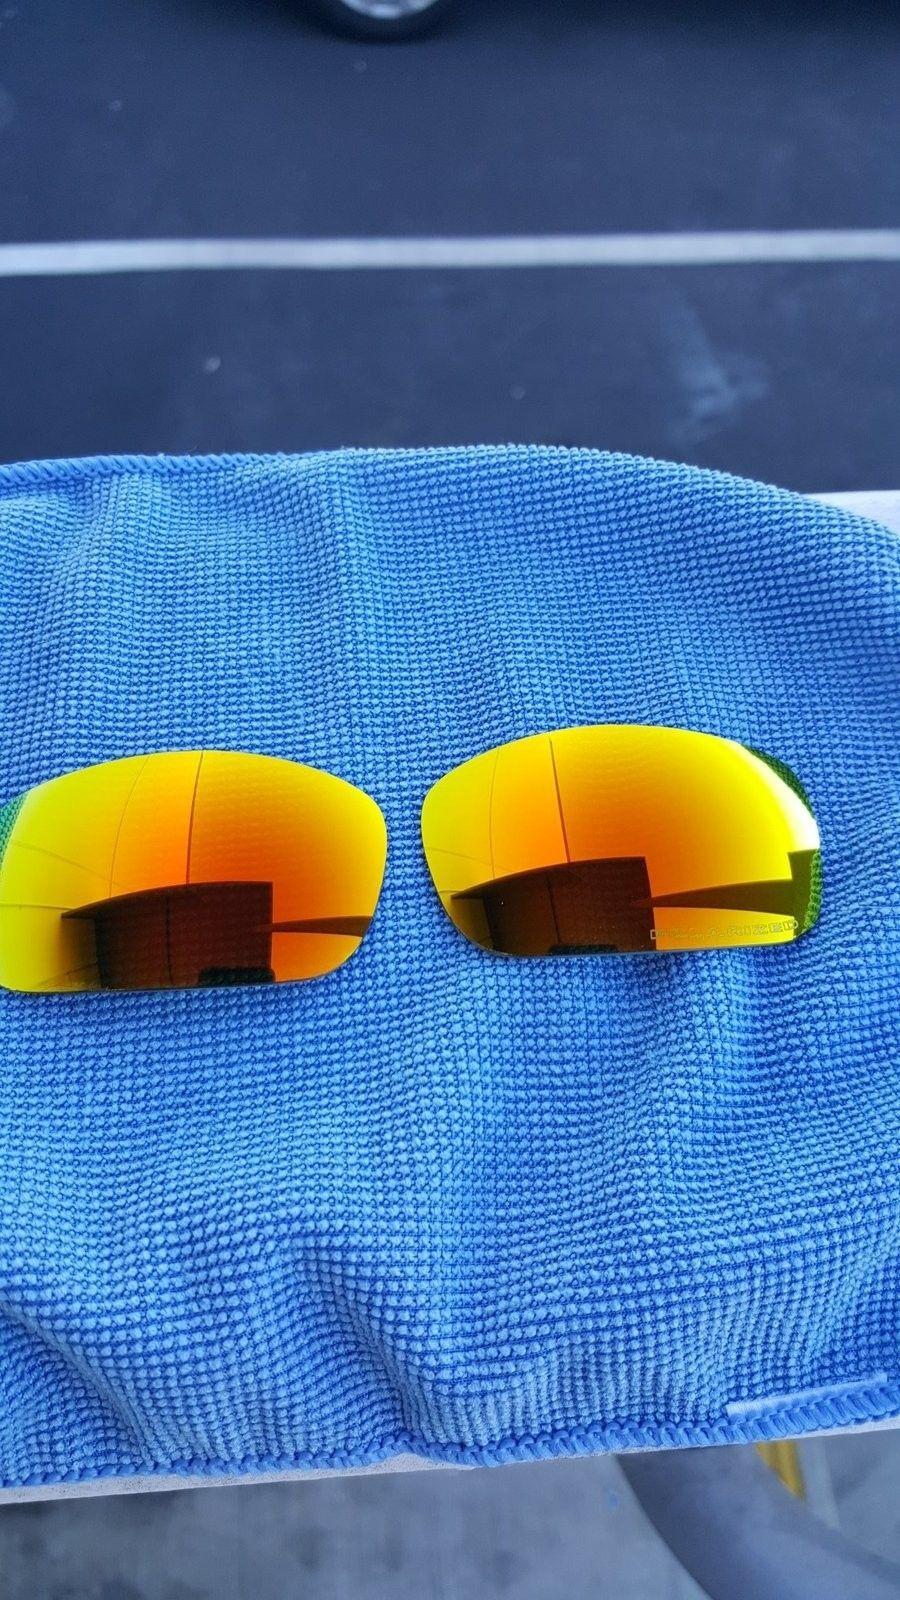 Like New - Xm X Squared +Xmas Bonus Lenses- 475.00 Shipped/All - 20151111_092401.jpg